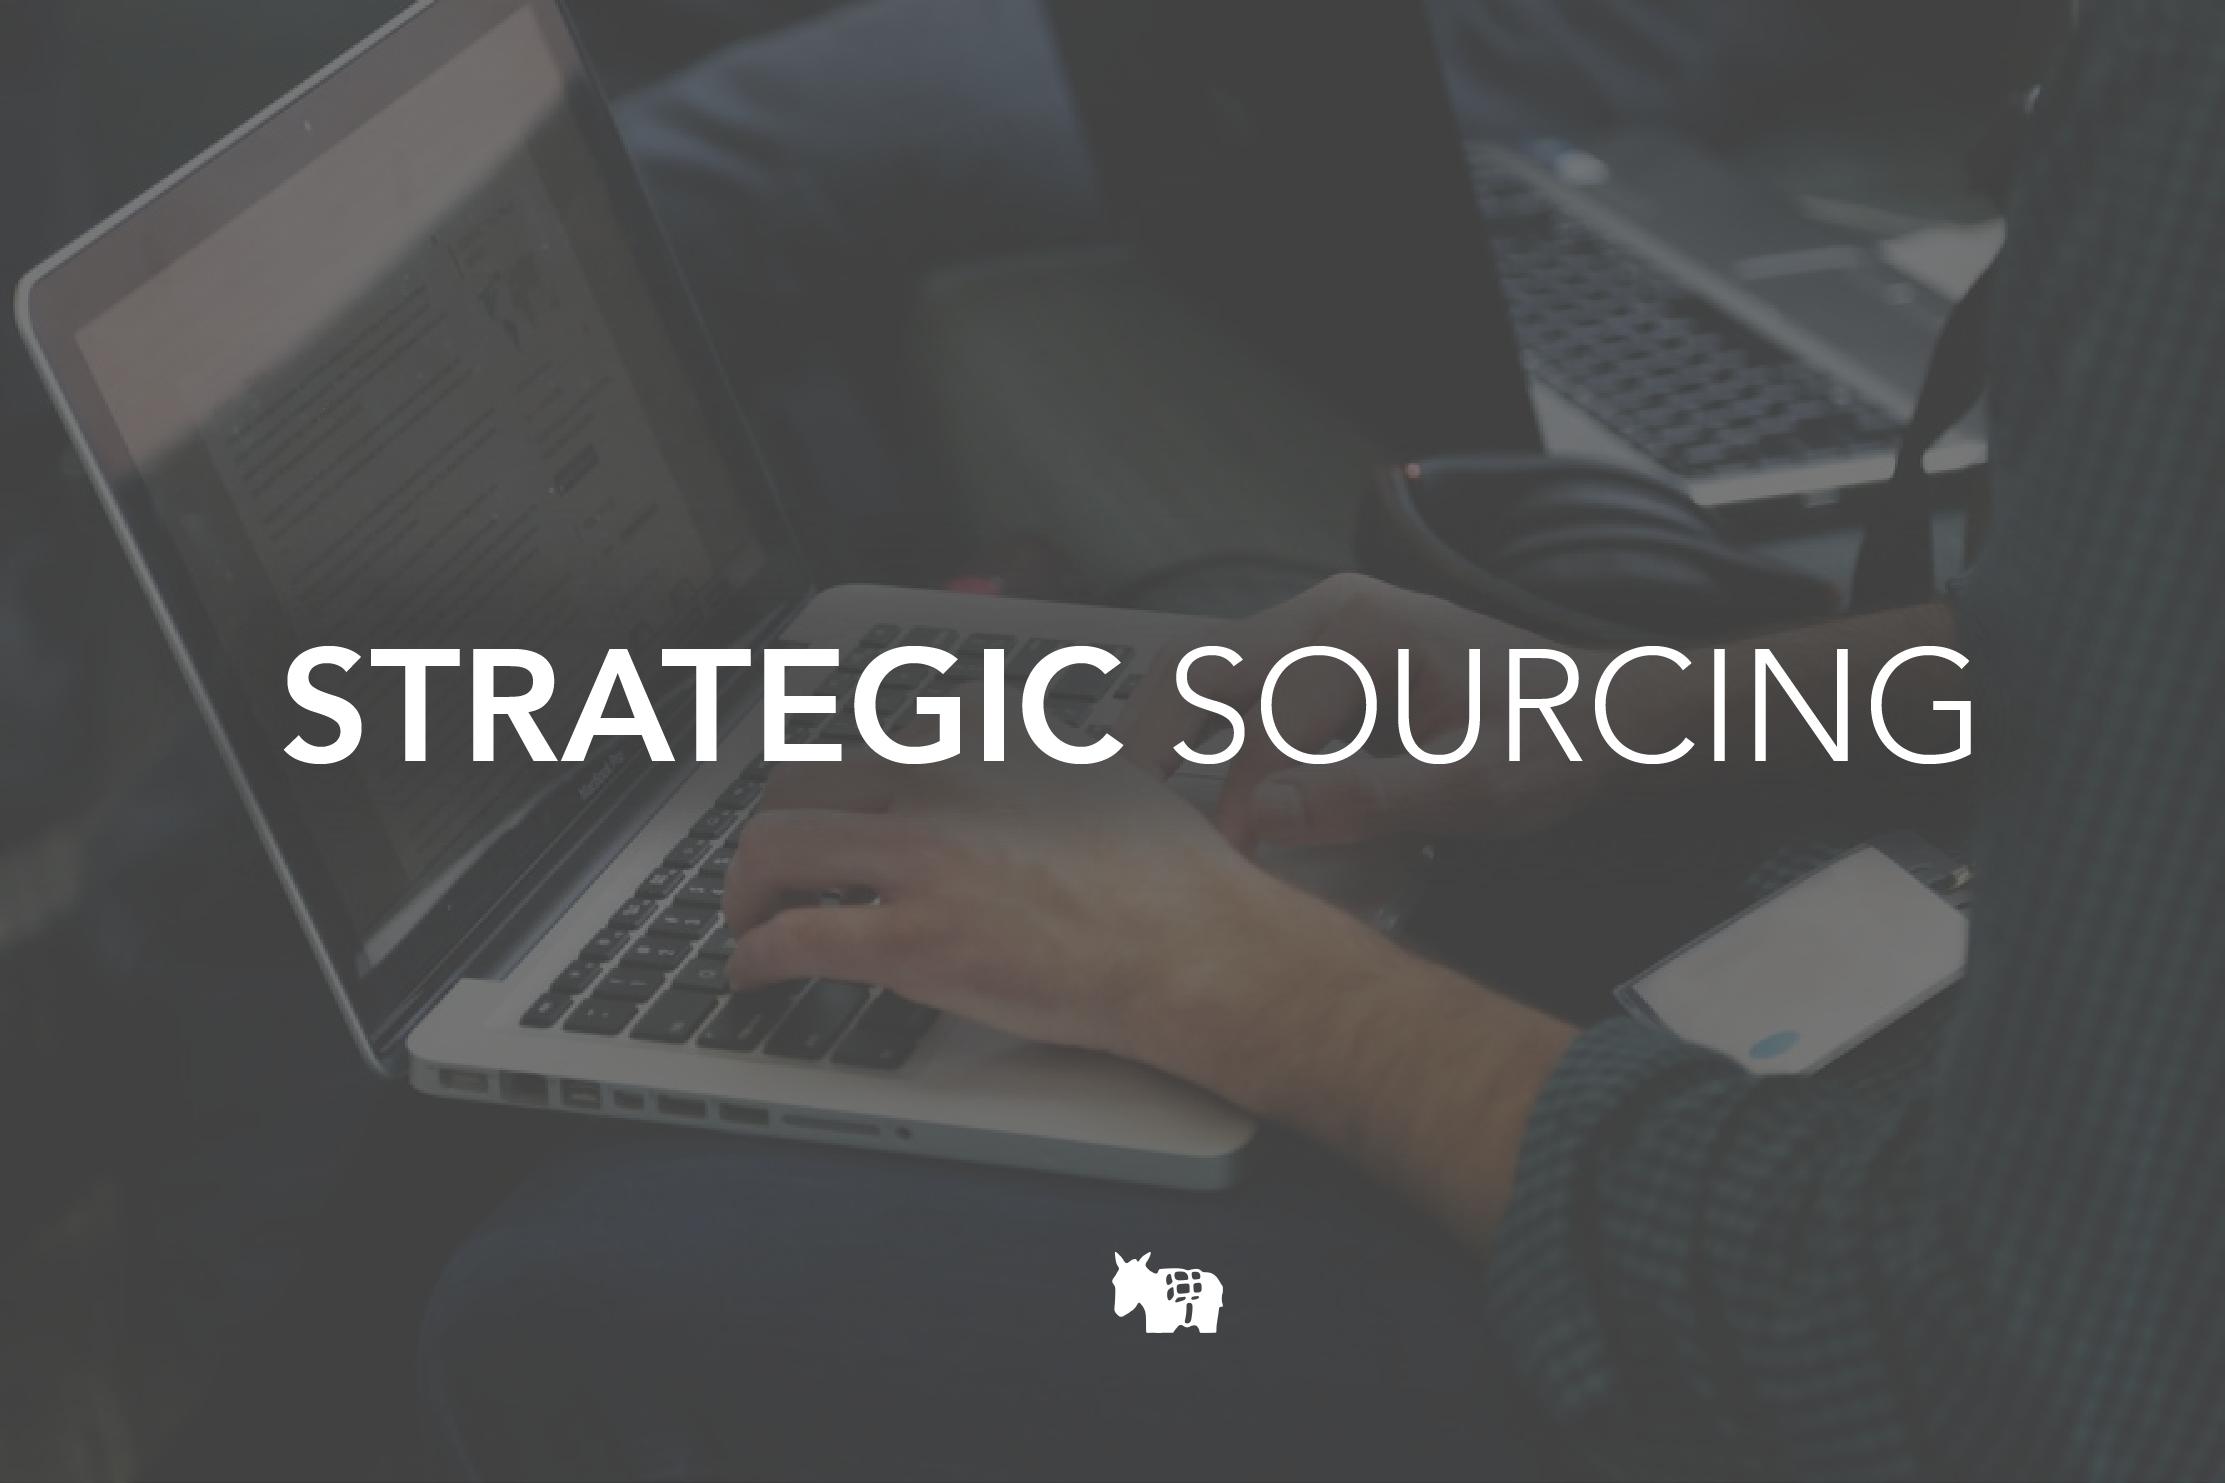 strategic sourcing local supplier spend